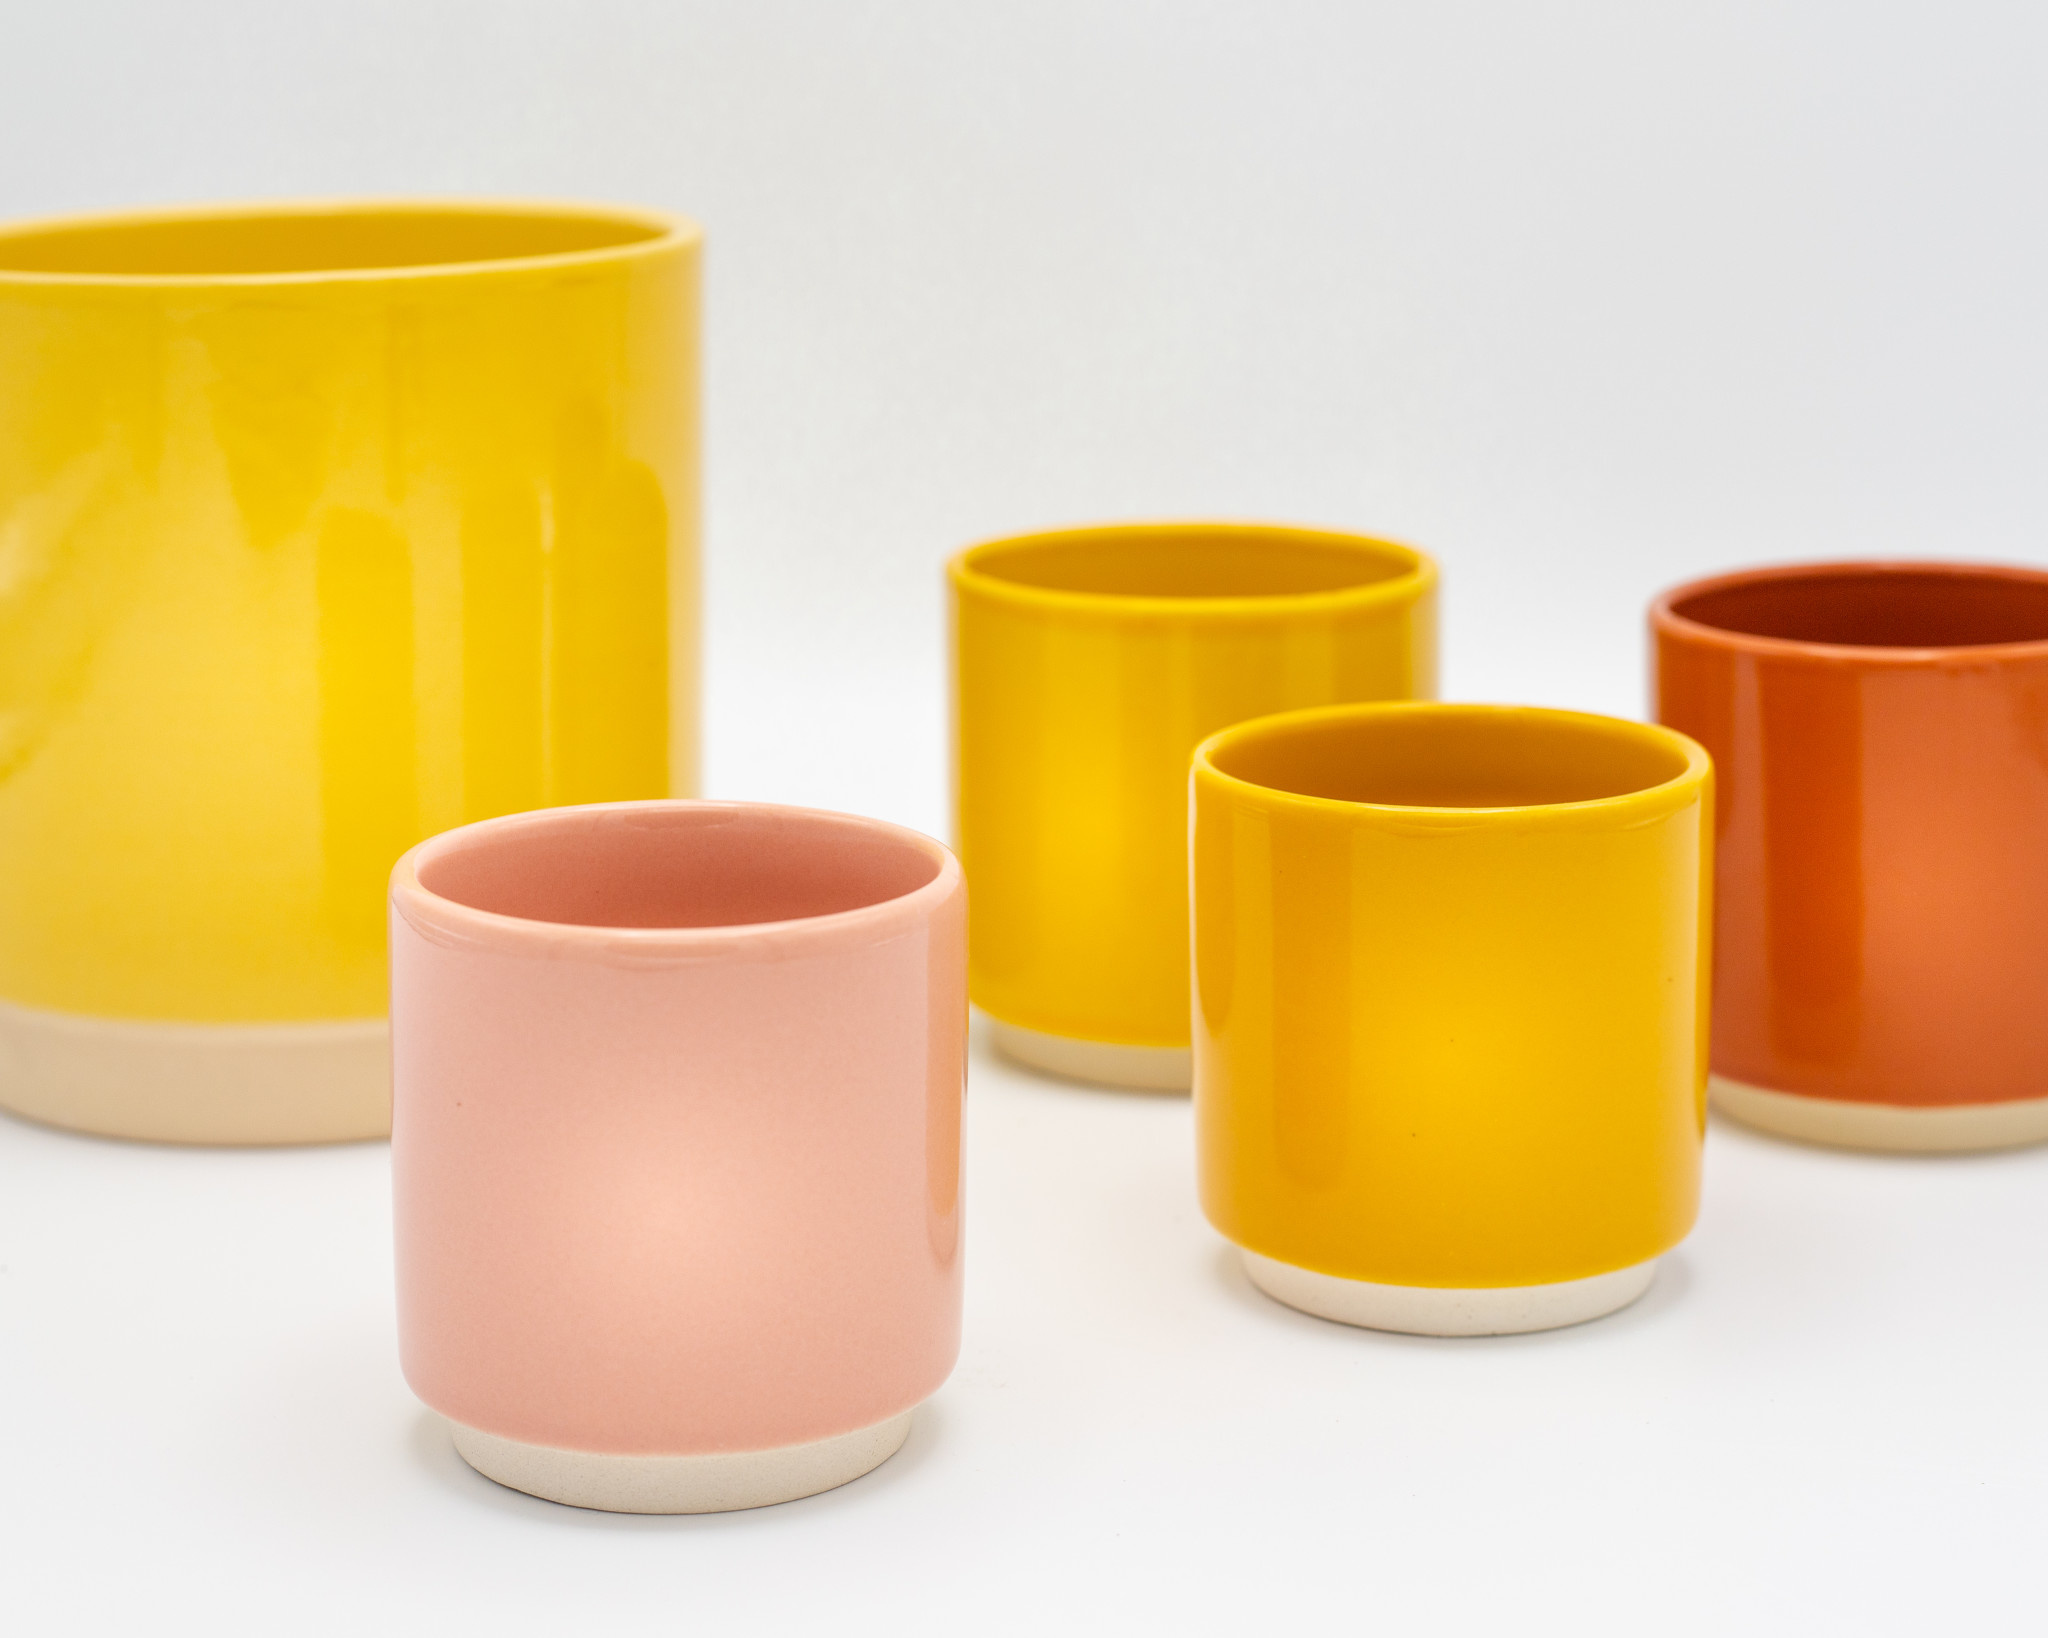 Bloempot Terracotta - Medium-2